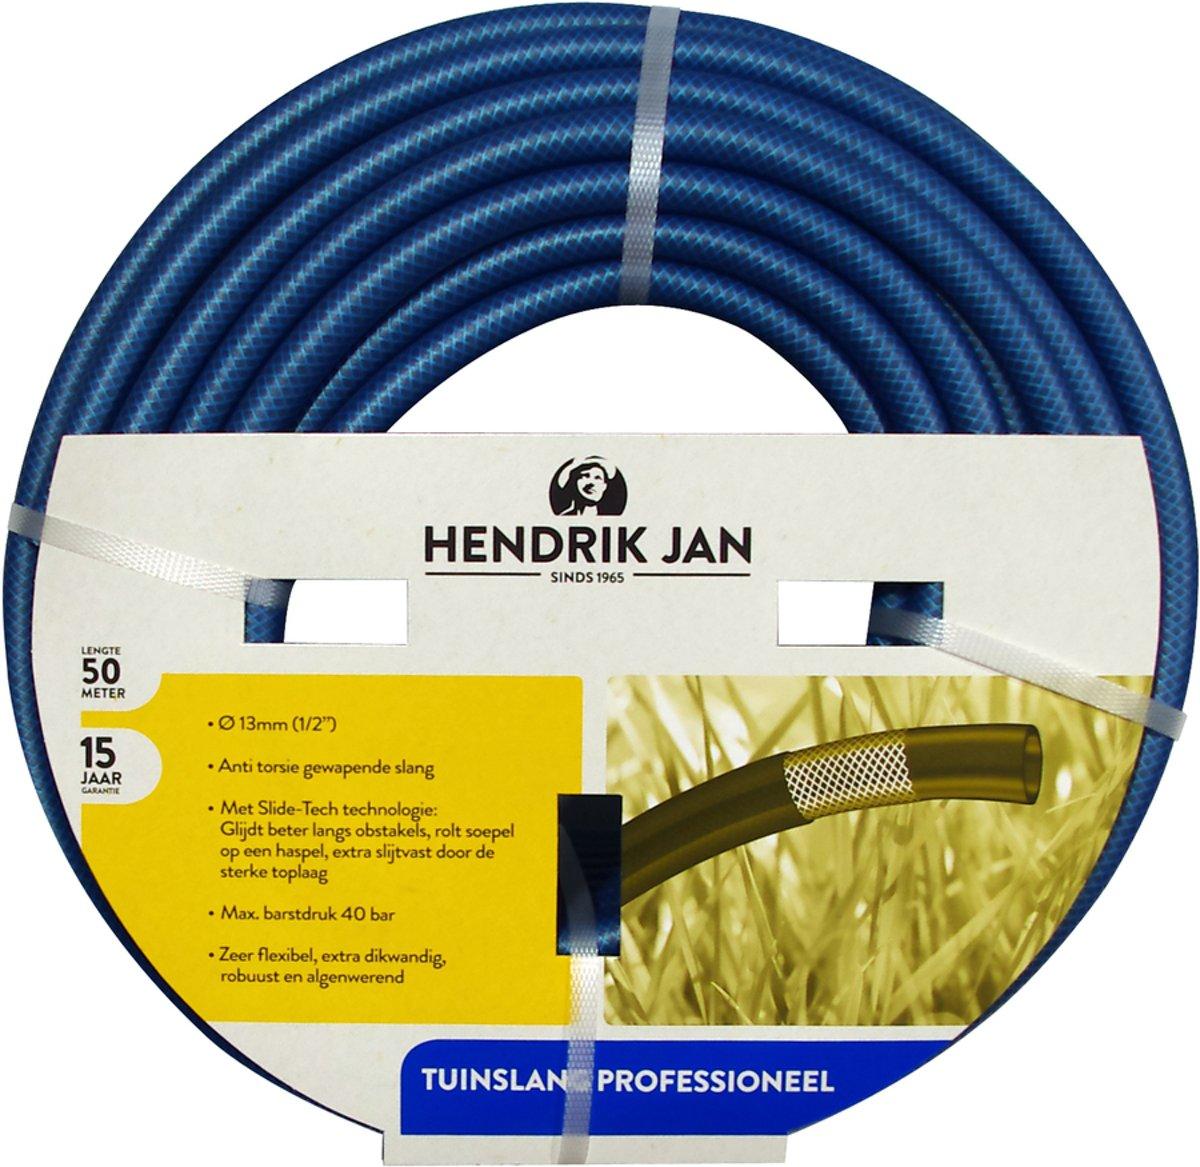 "Hendrik Jan tuinslang professioneel 13 mm (1/2"") 50 m kopen"